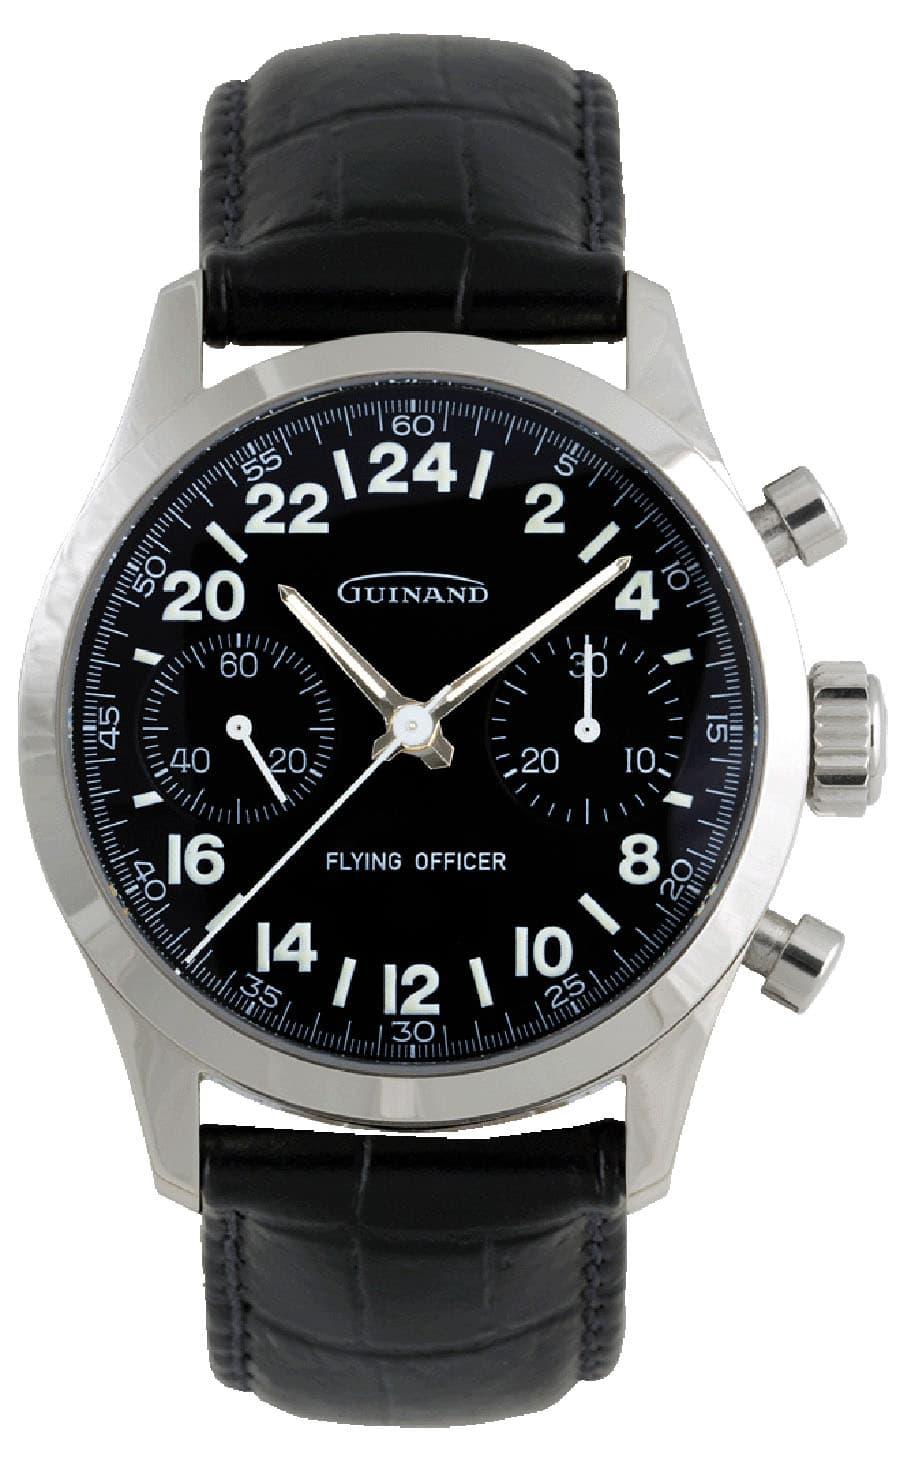 Guinand: Flying Officer